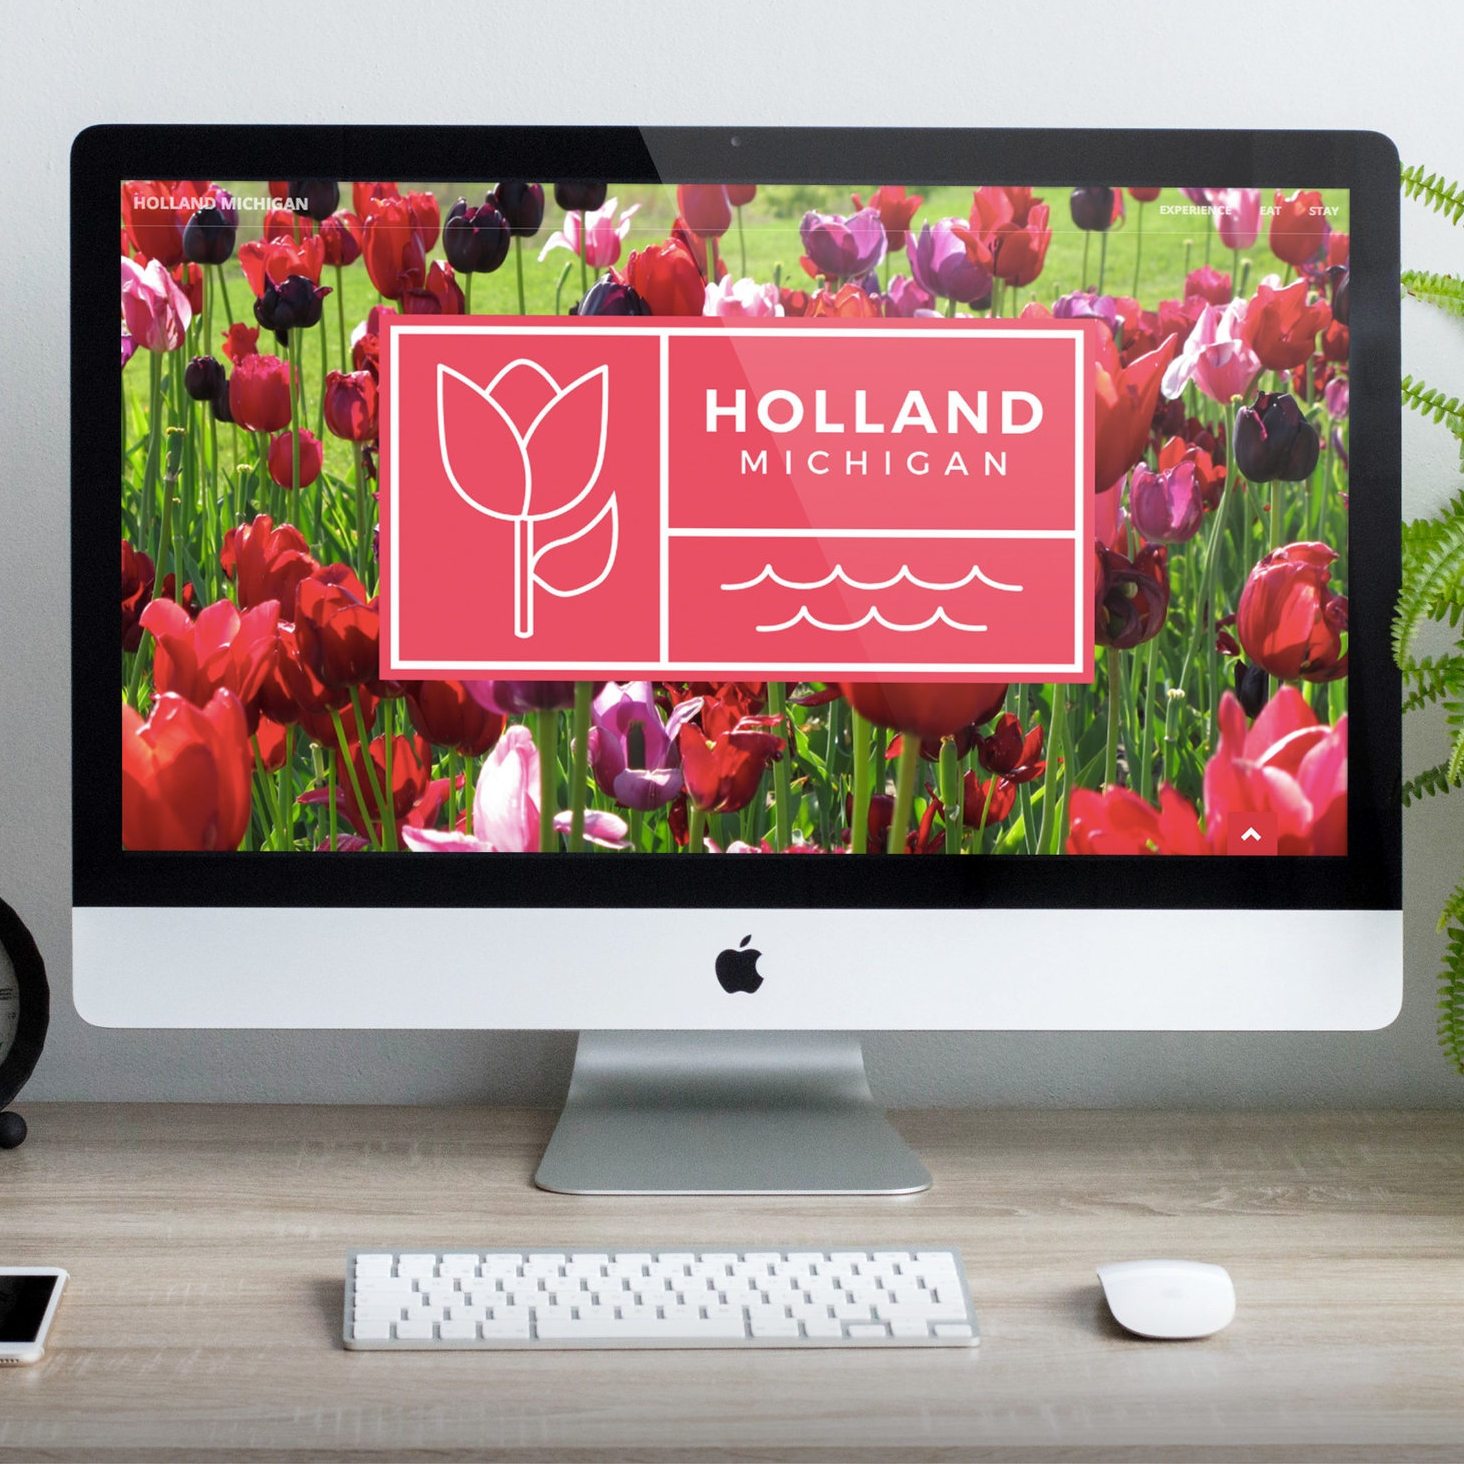 Holland Michigan Travel Website